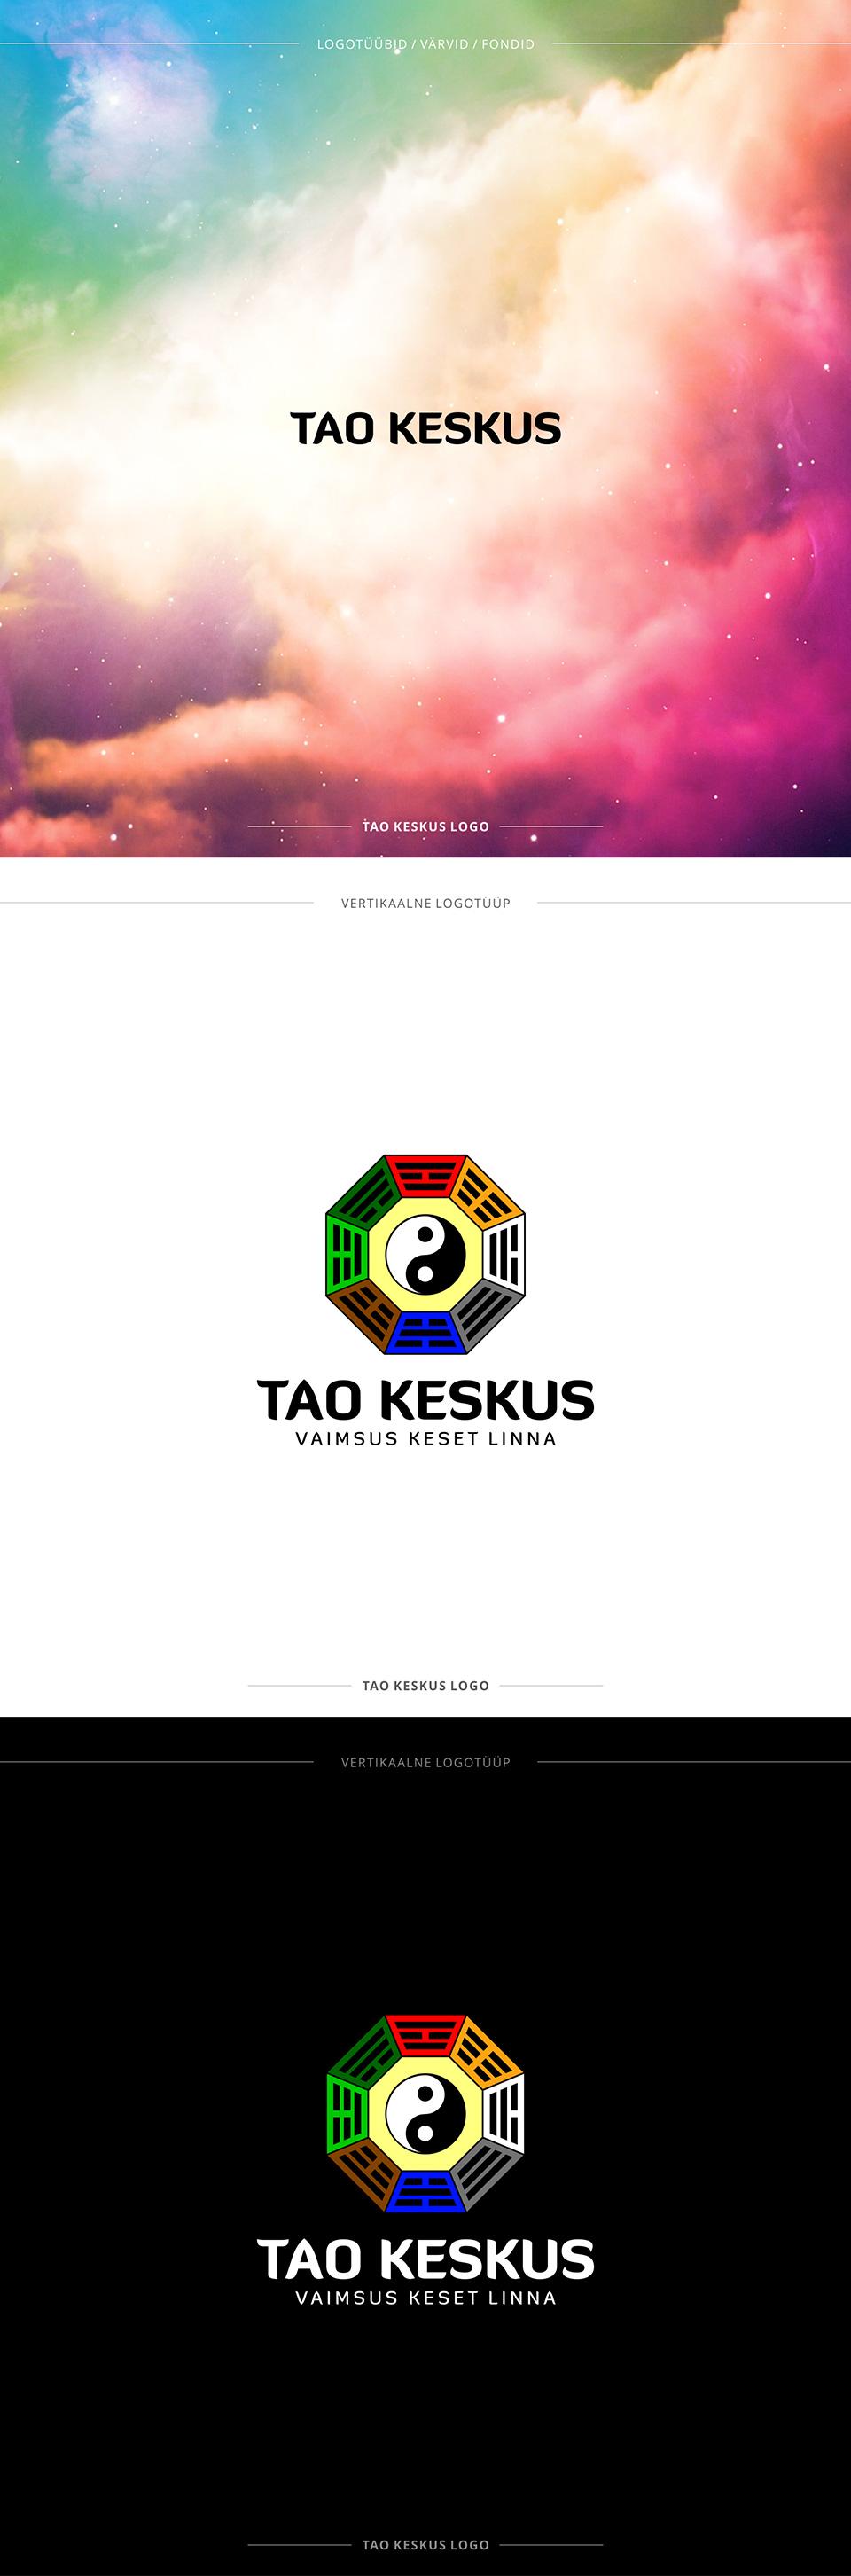 taokeskus-logo-1